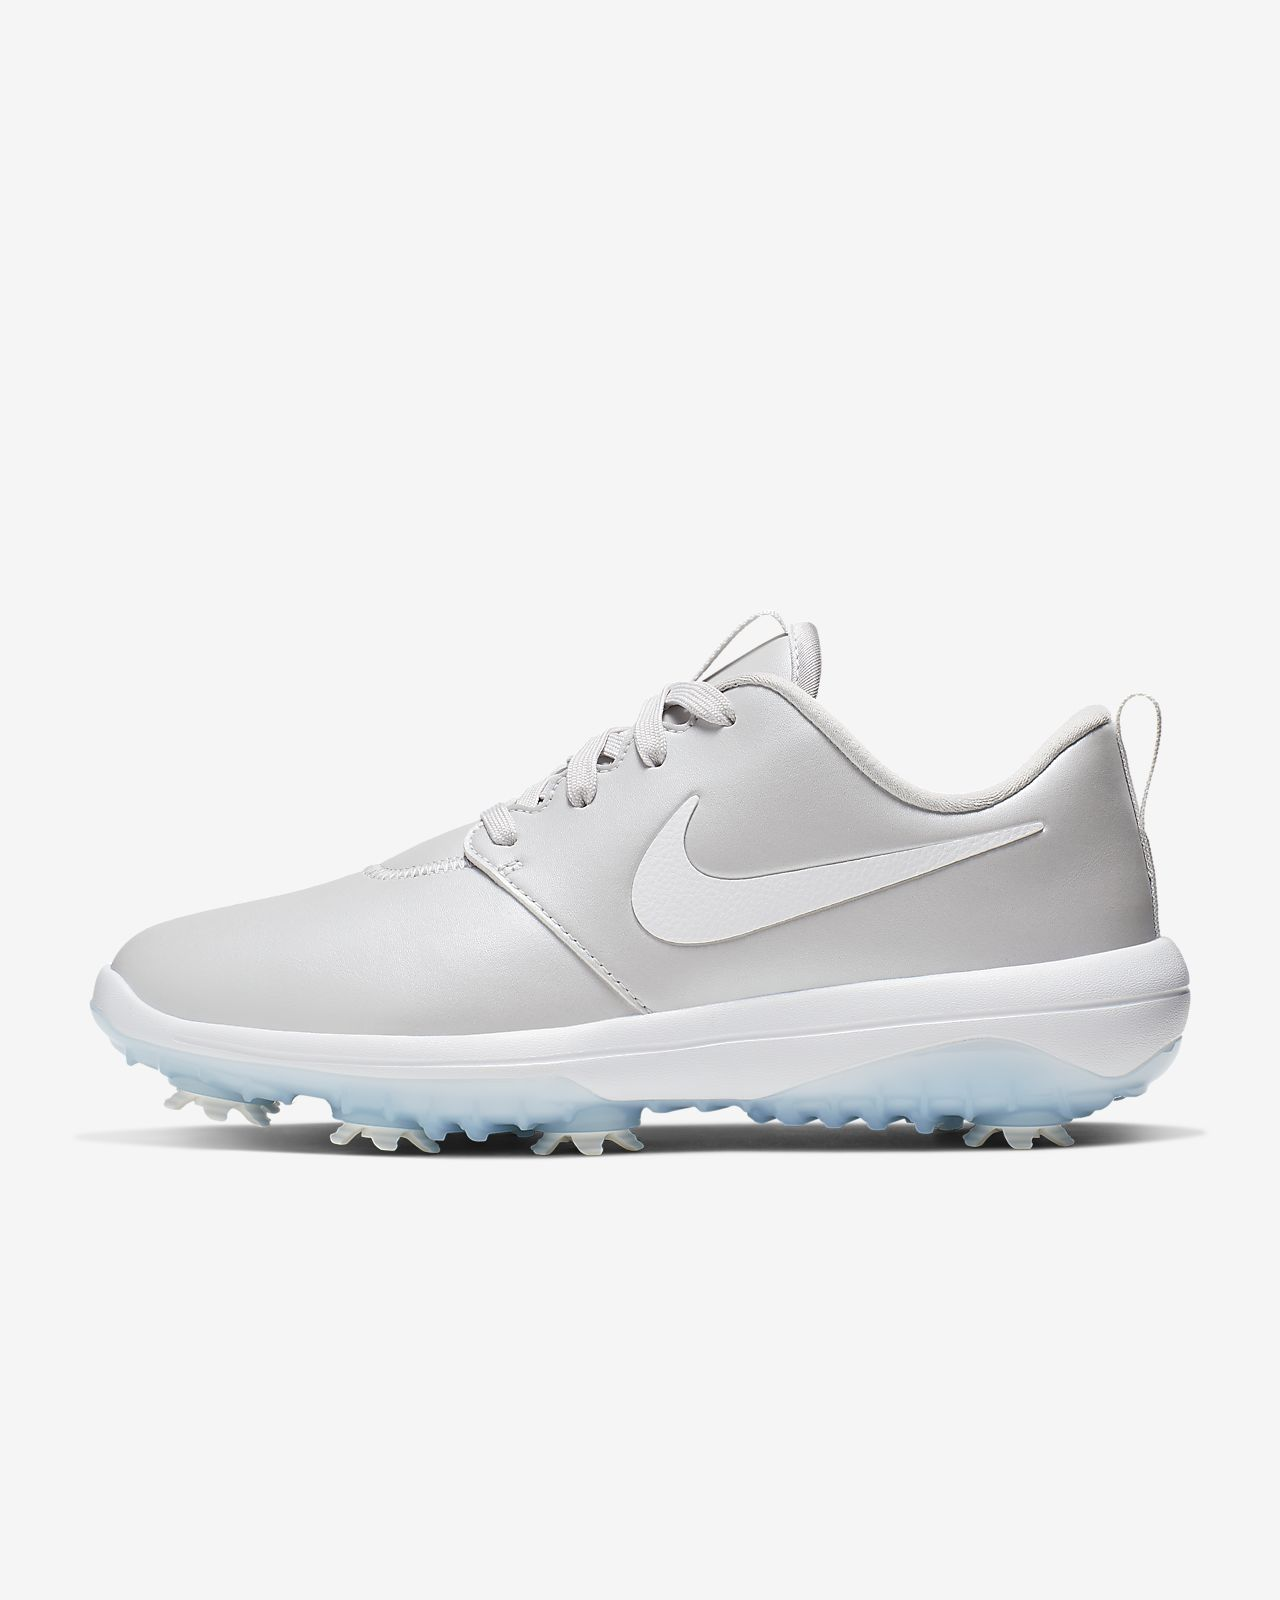 NikeRoshe G Tour (W)女子高尔夫球鞋(宽版)